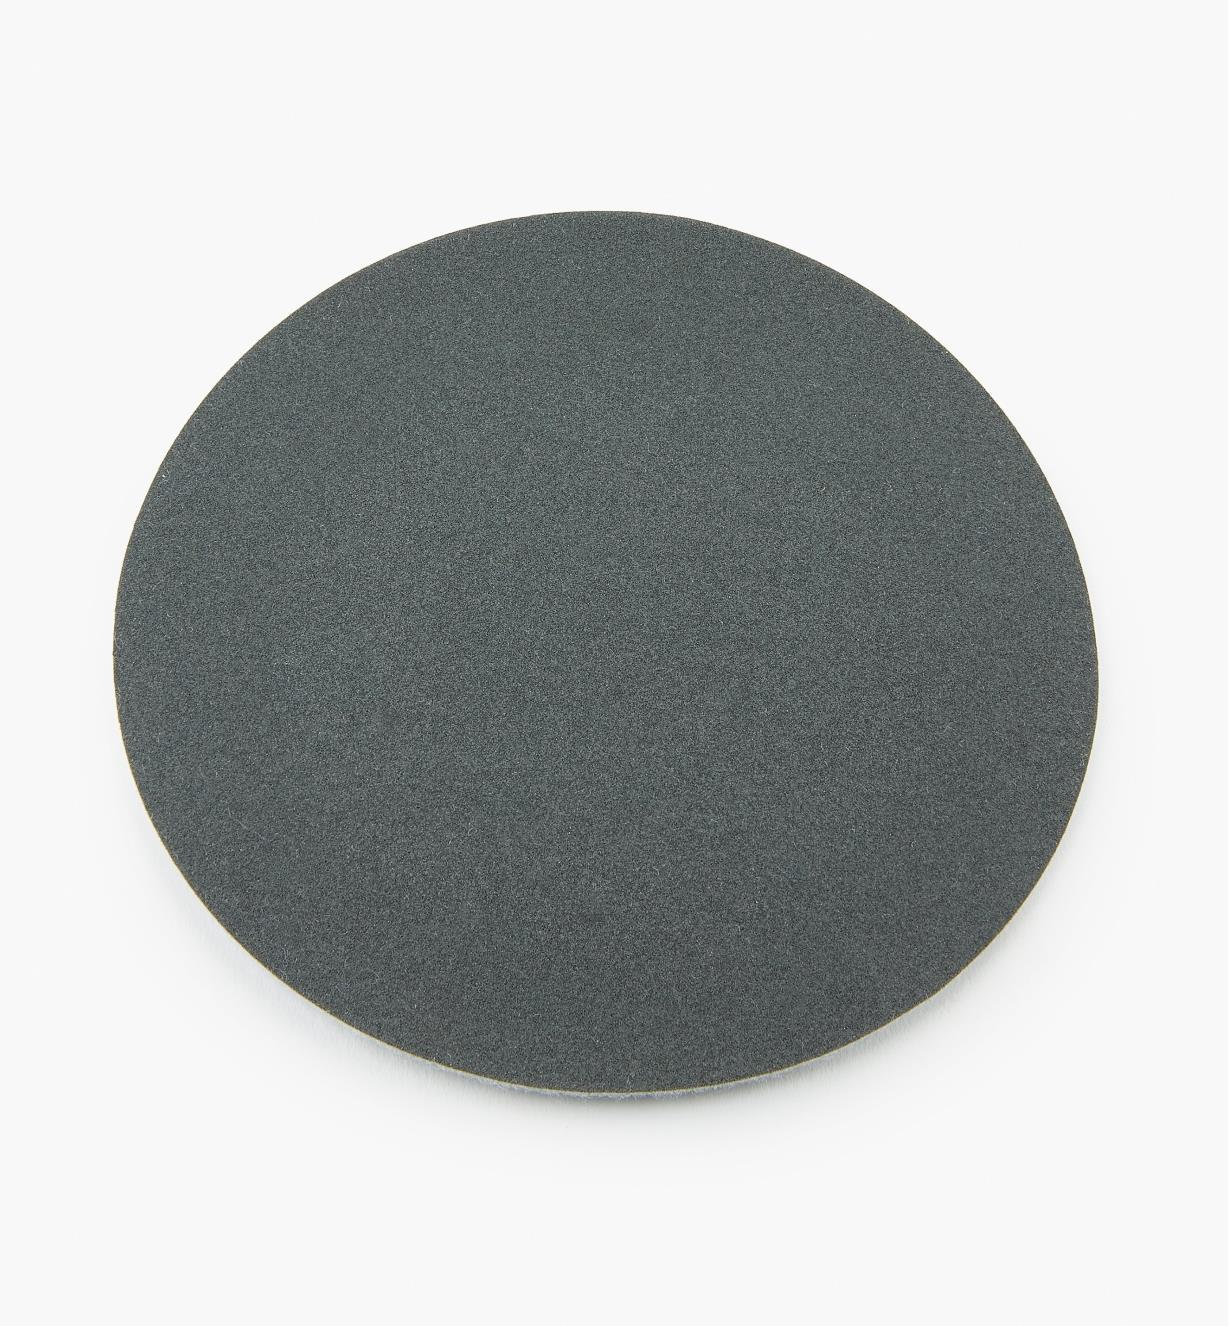 54K9032 - 2400x Micro-Mesh Disc, ea.